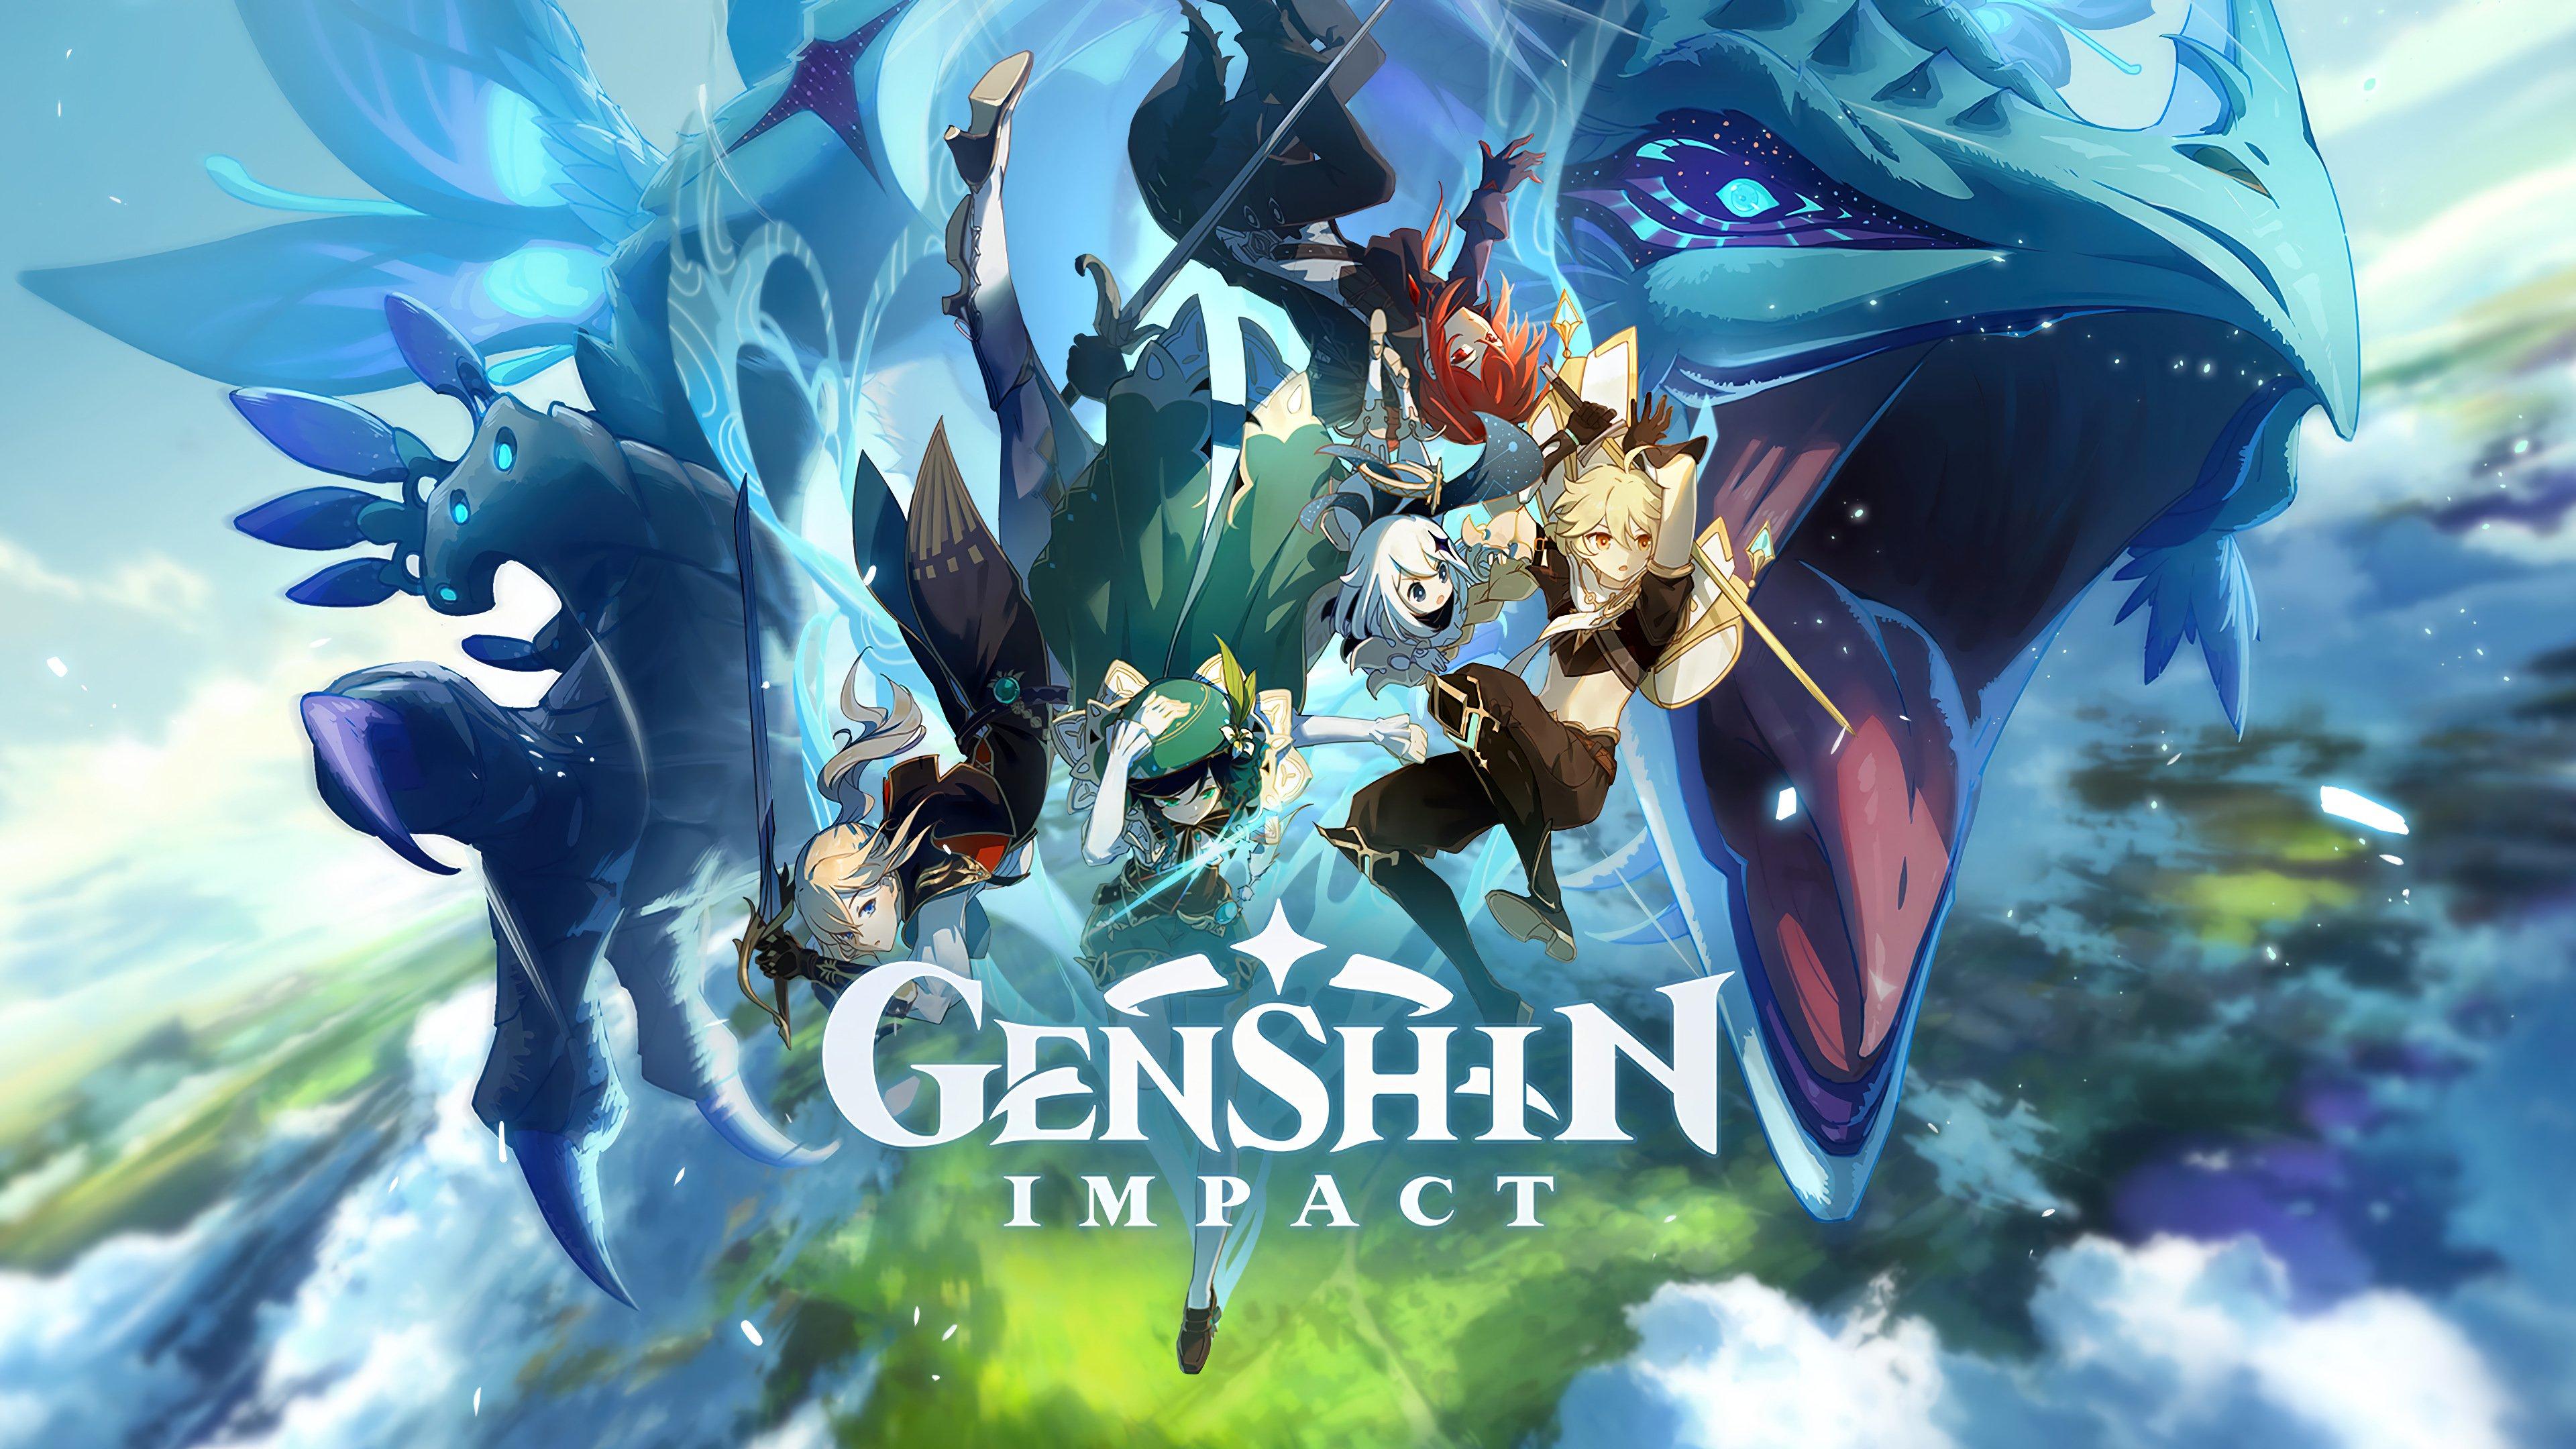 Fondos de pantalla Genshin Impact Personajes